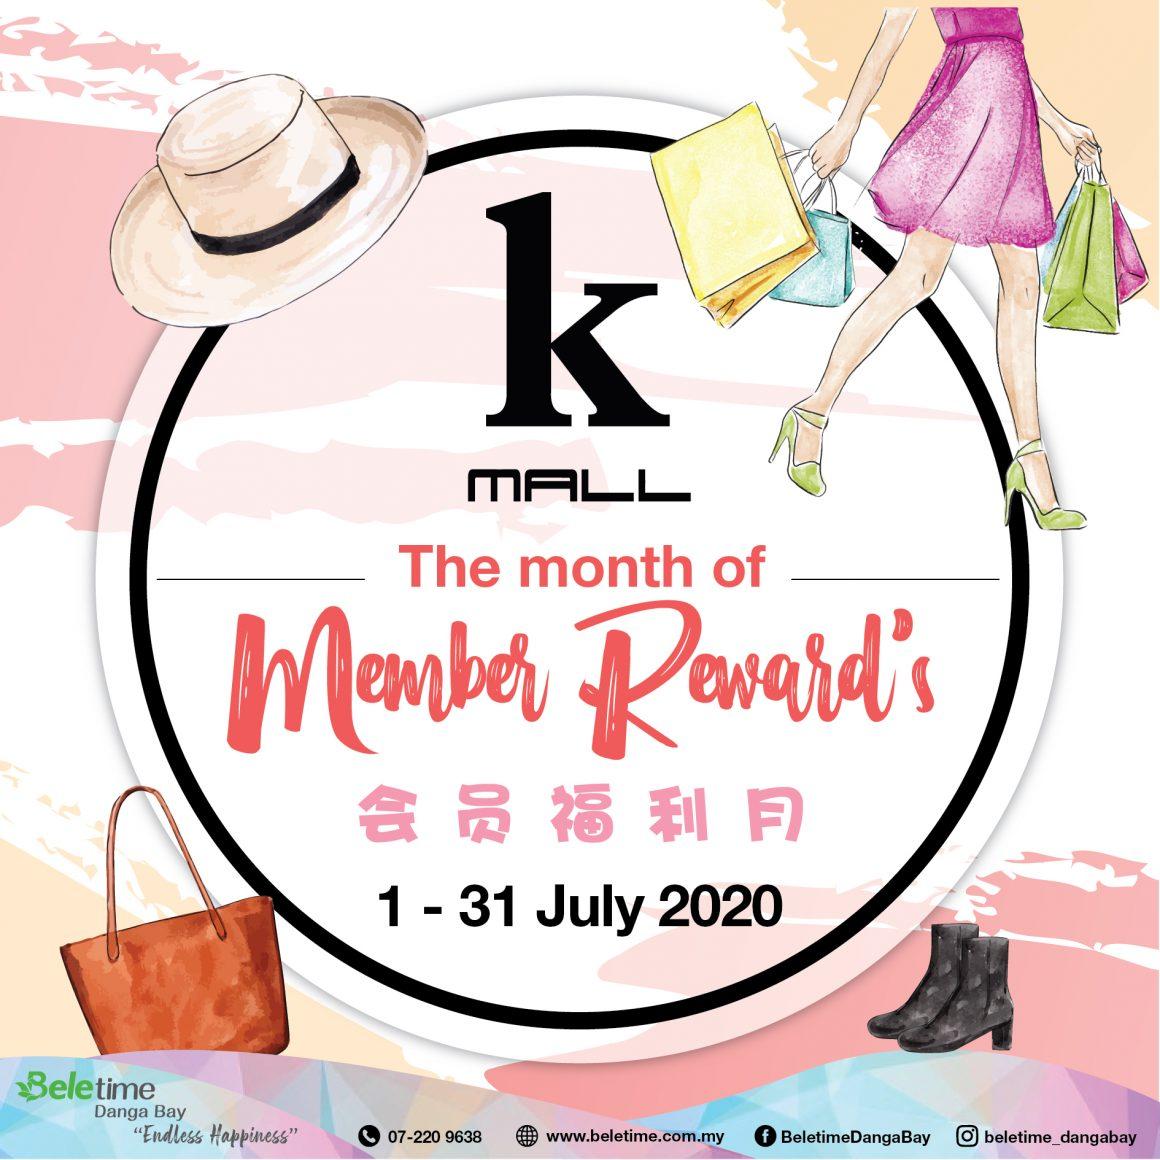 K-Mall • Member Reward's